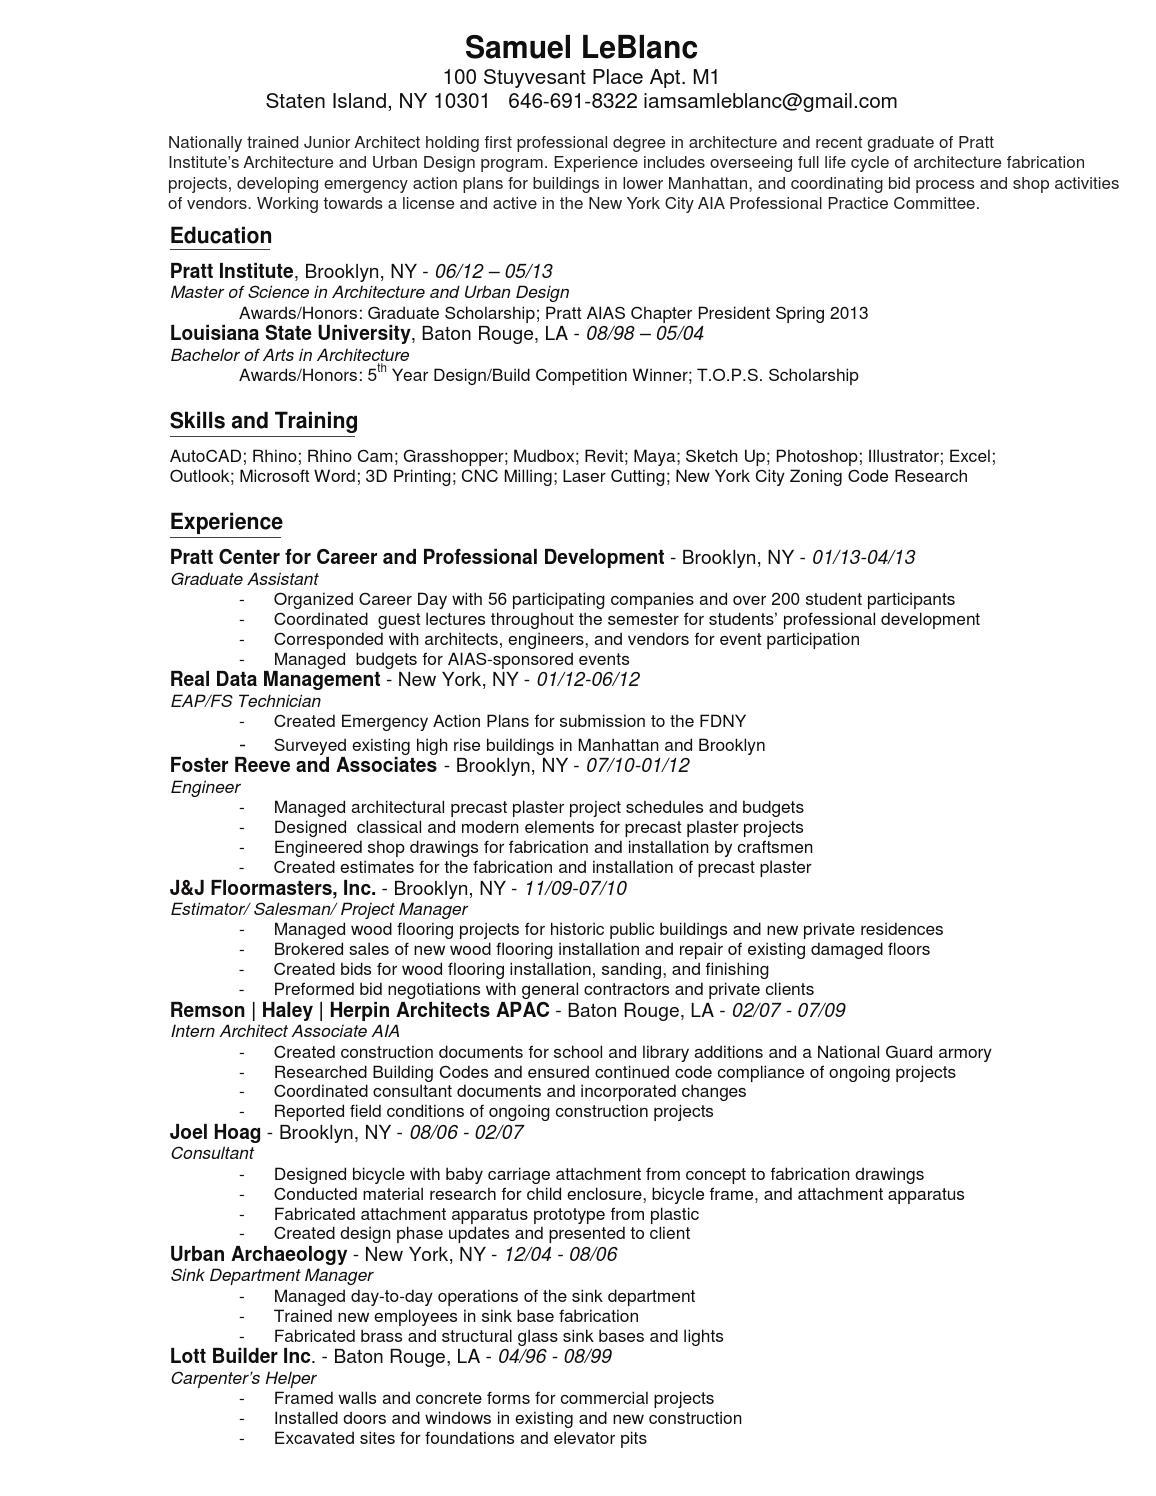 Sam leblanc resume and worksample by Sam LeBlanc - issuu